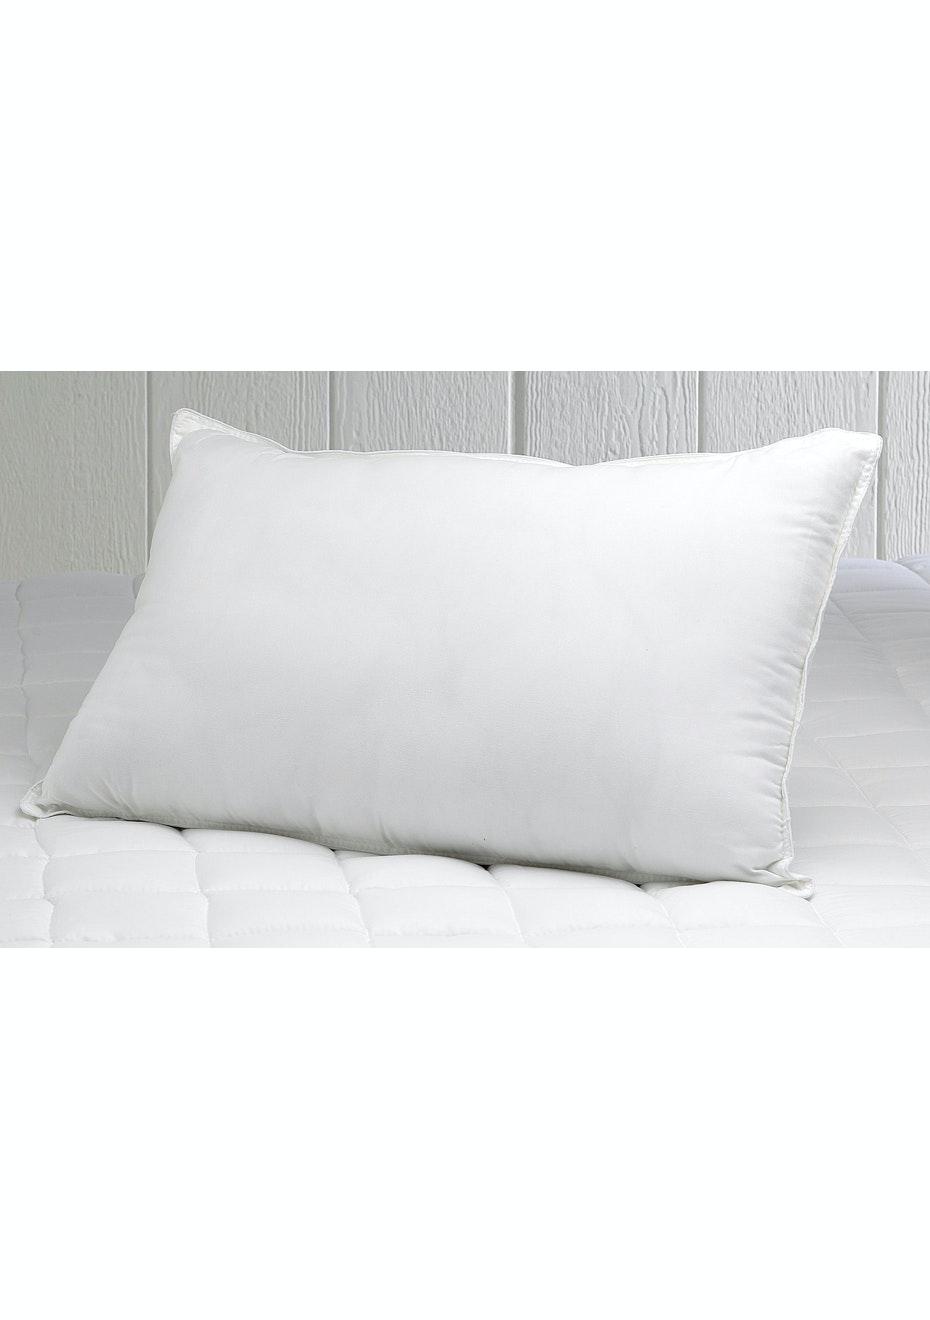 Luxury Microlush Pillow 1200 gms - super lofty